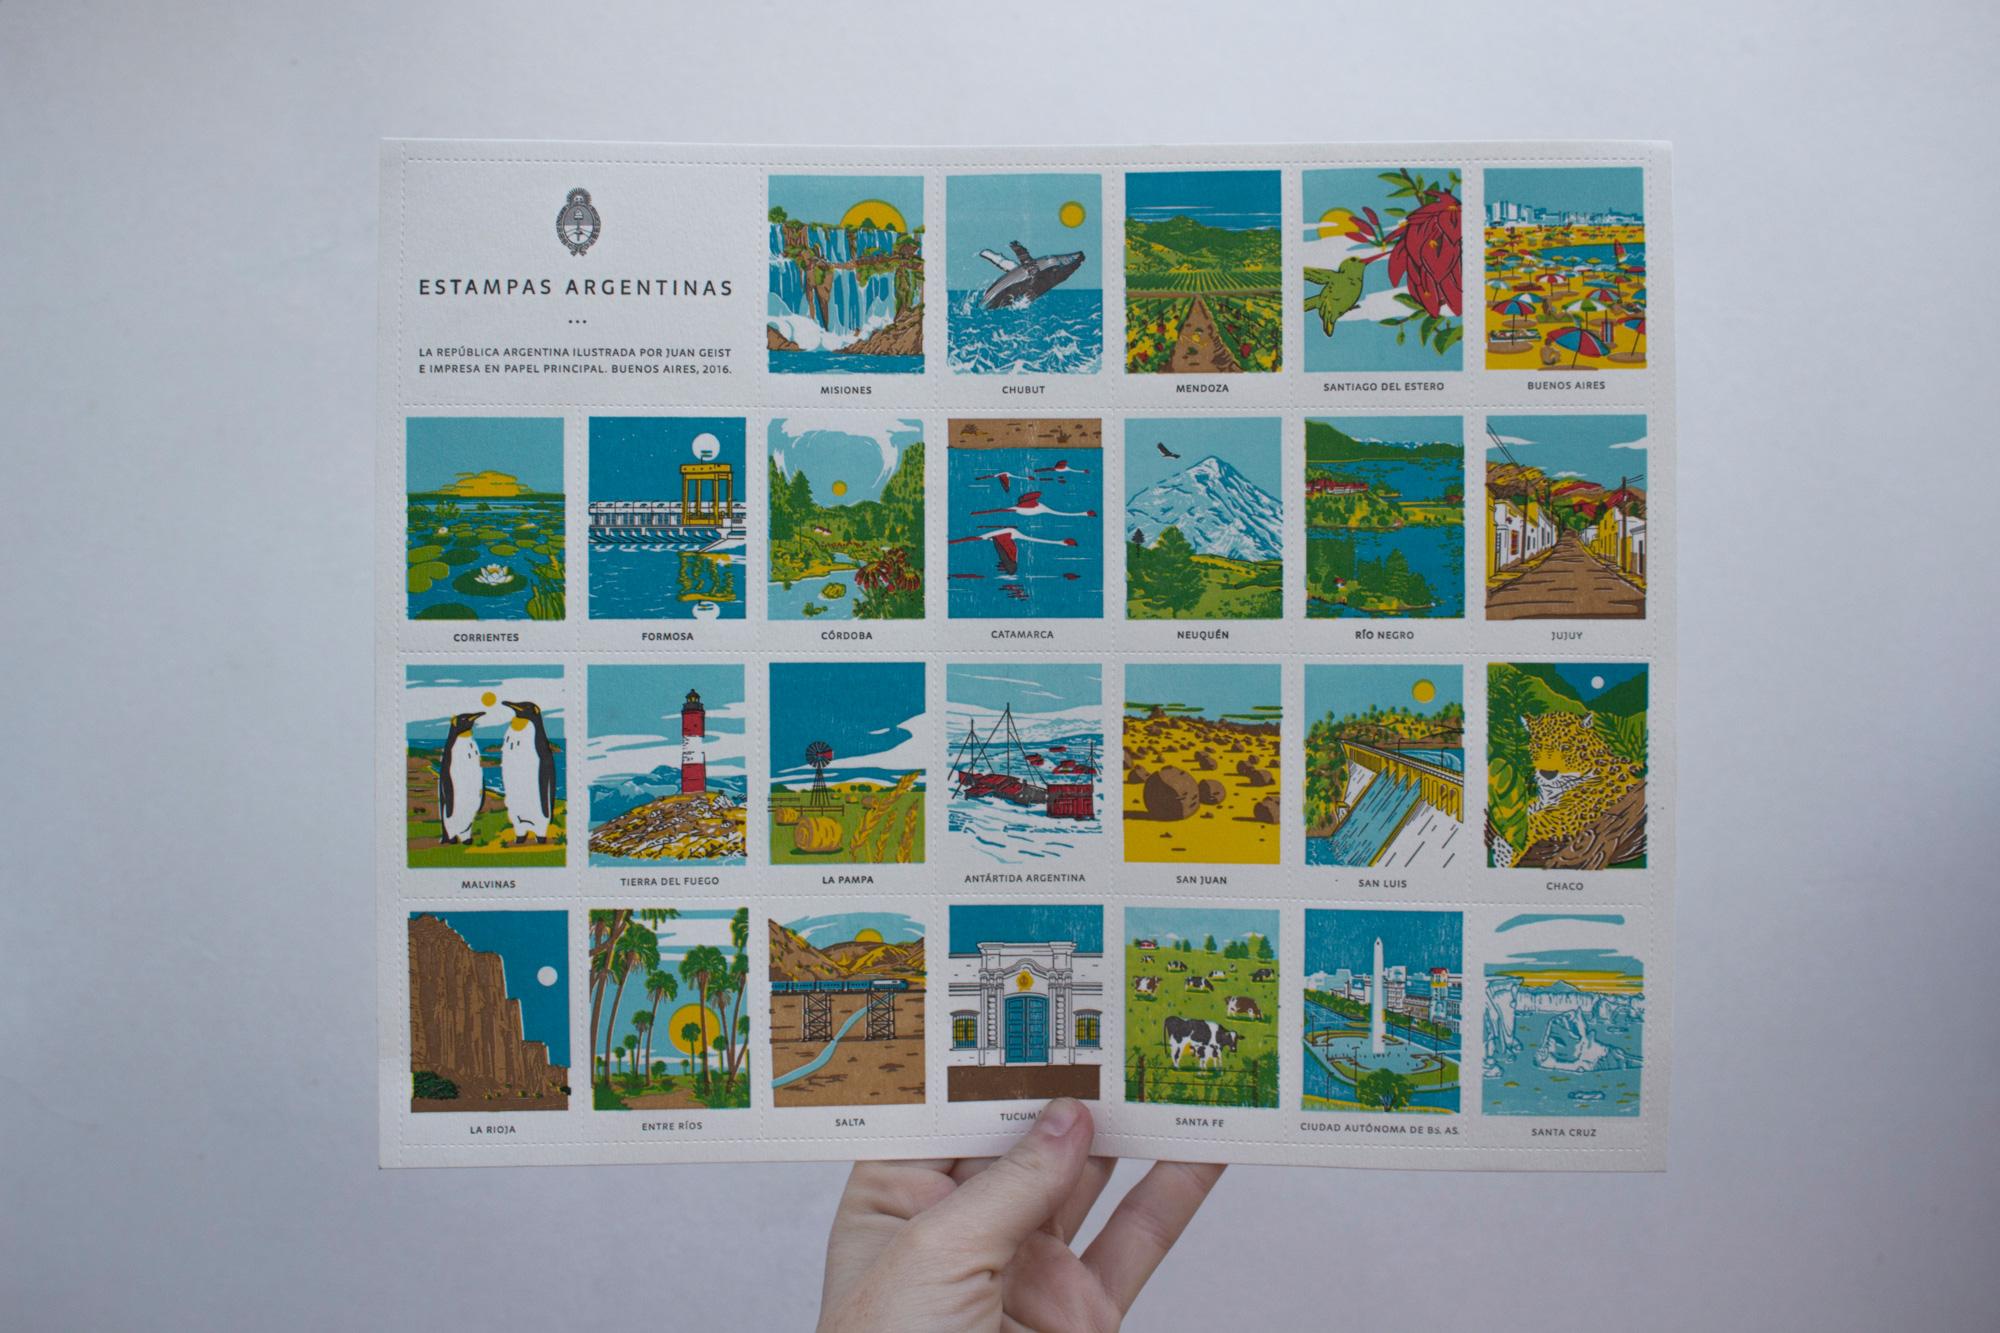 estampas-argentinas-juan-geist-papel-principal-letterpress-imprenta-tipografica-artesanal.jpg